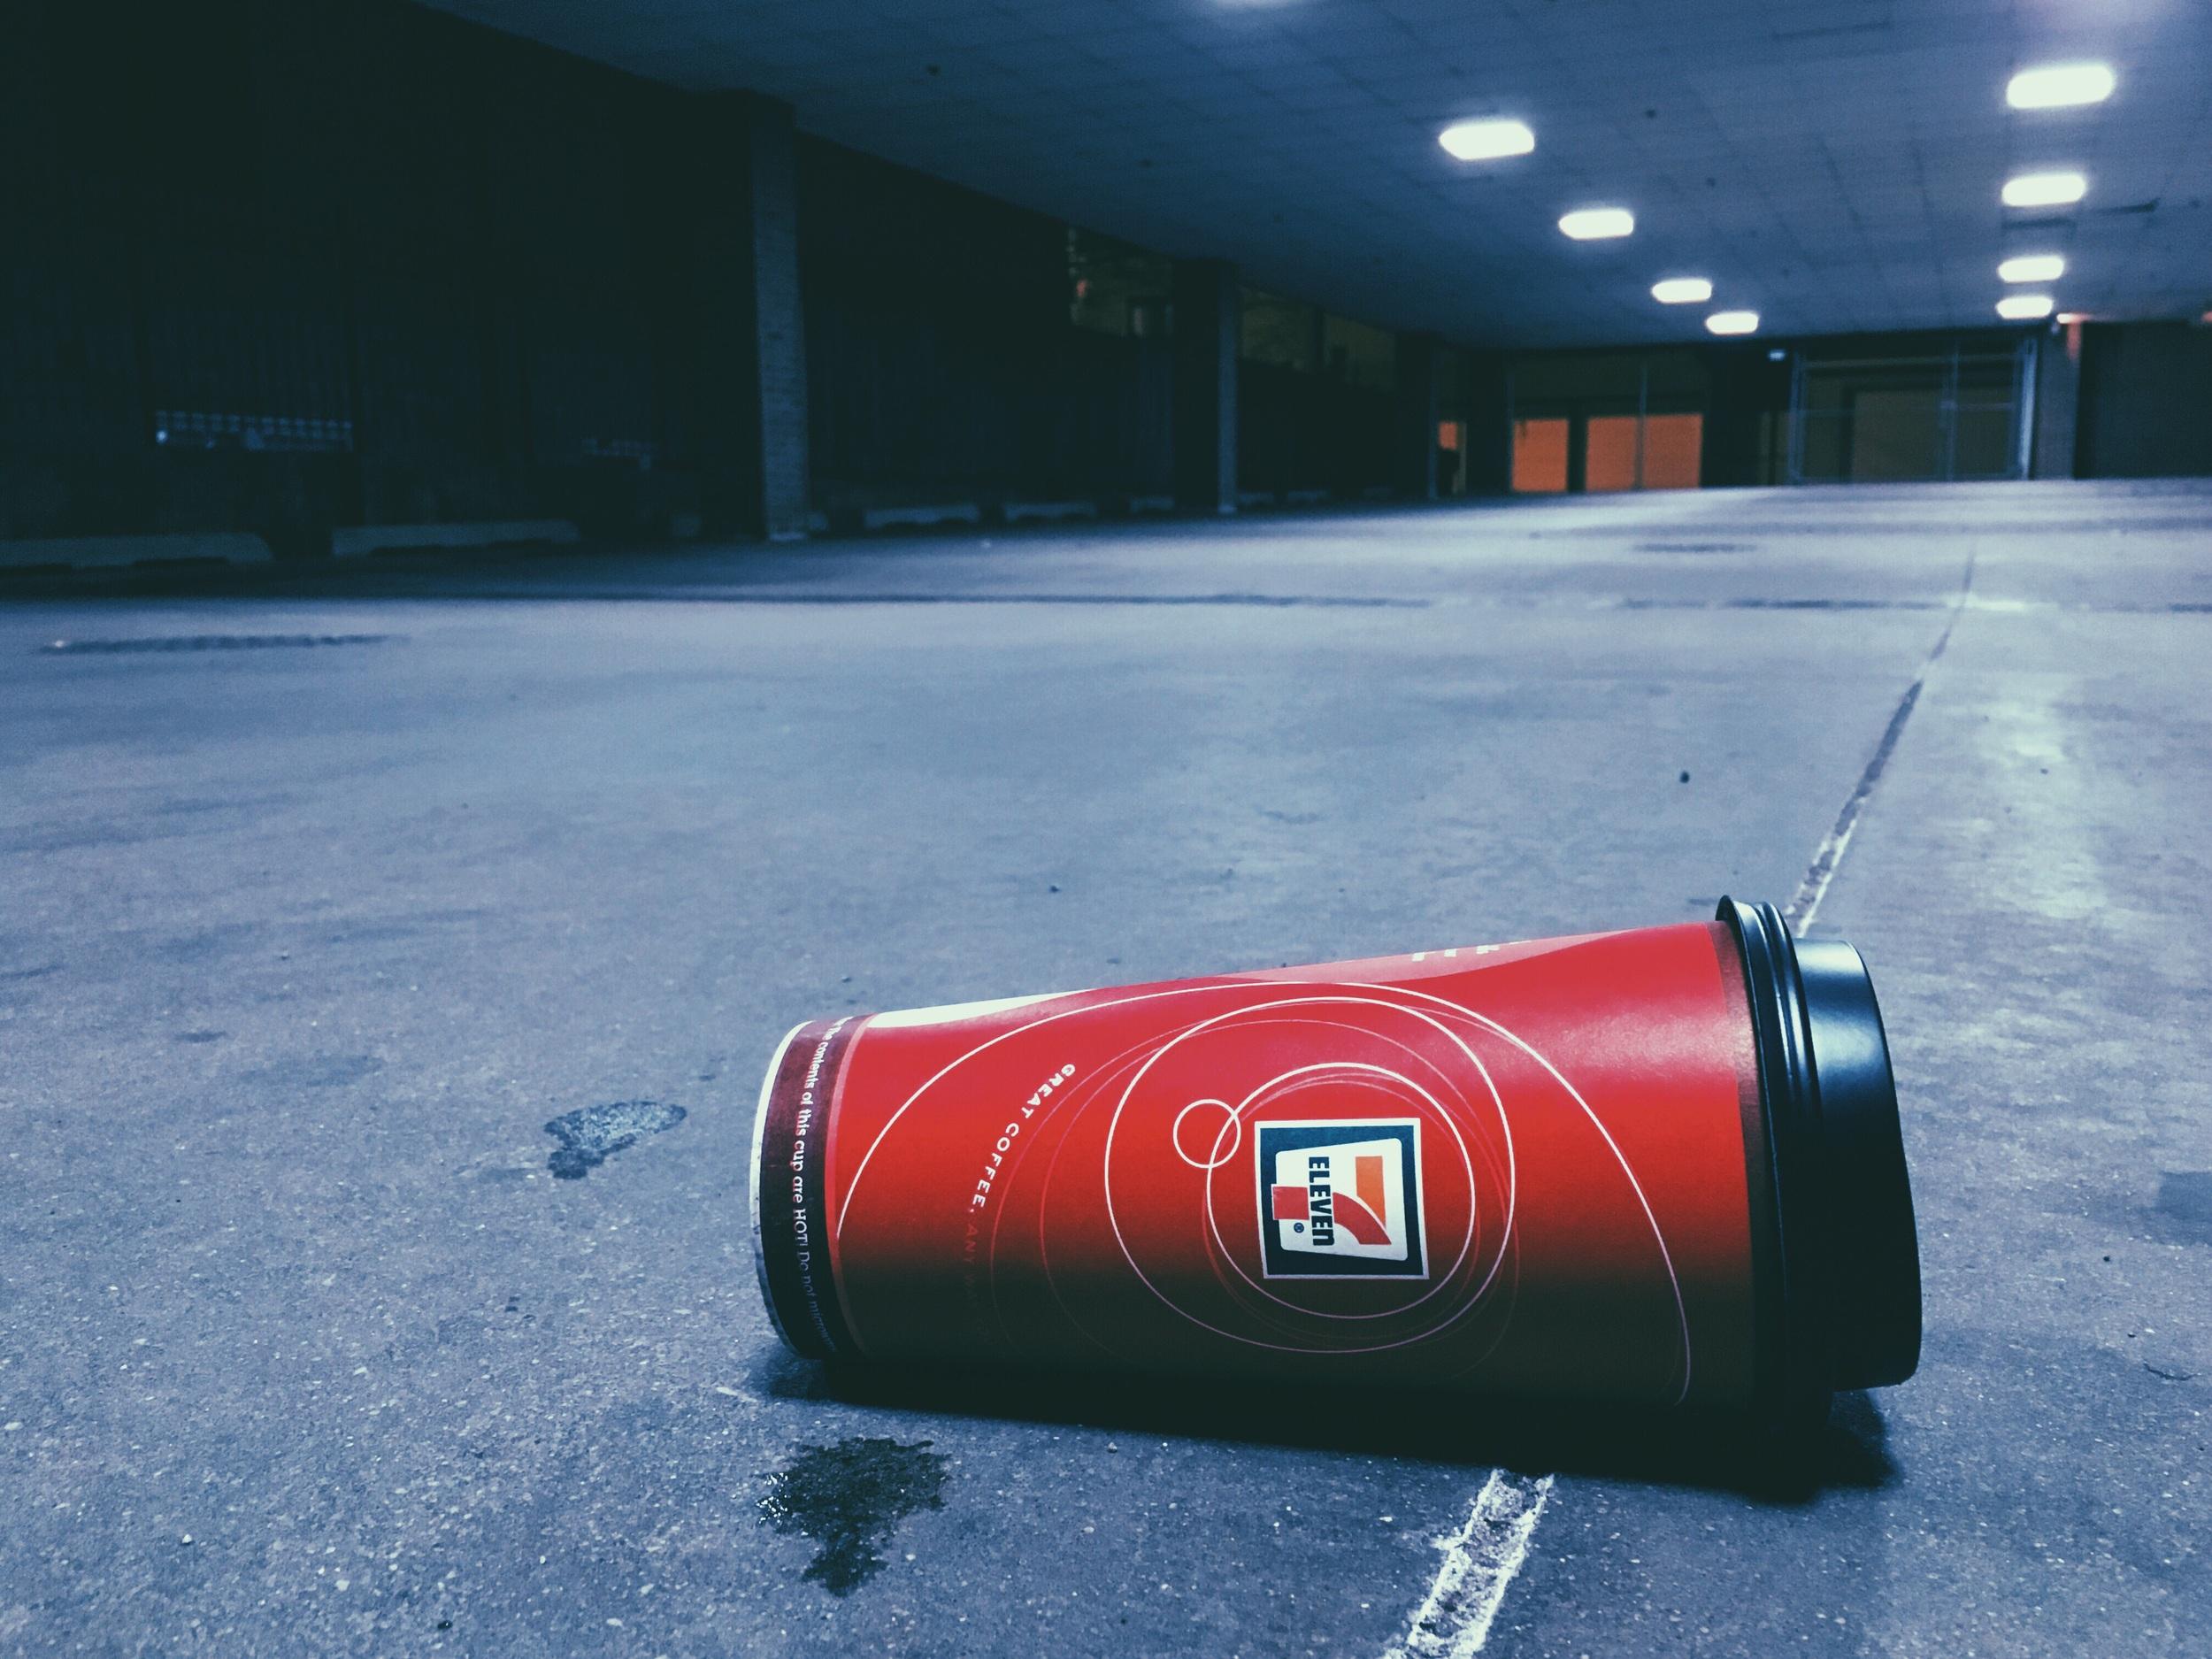 Red Trash